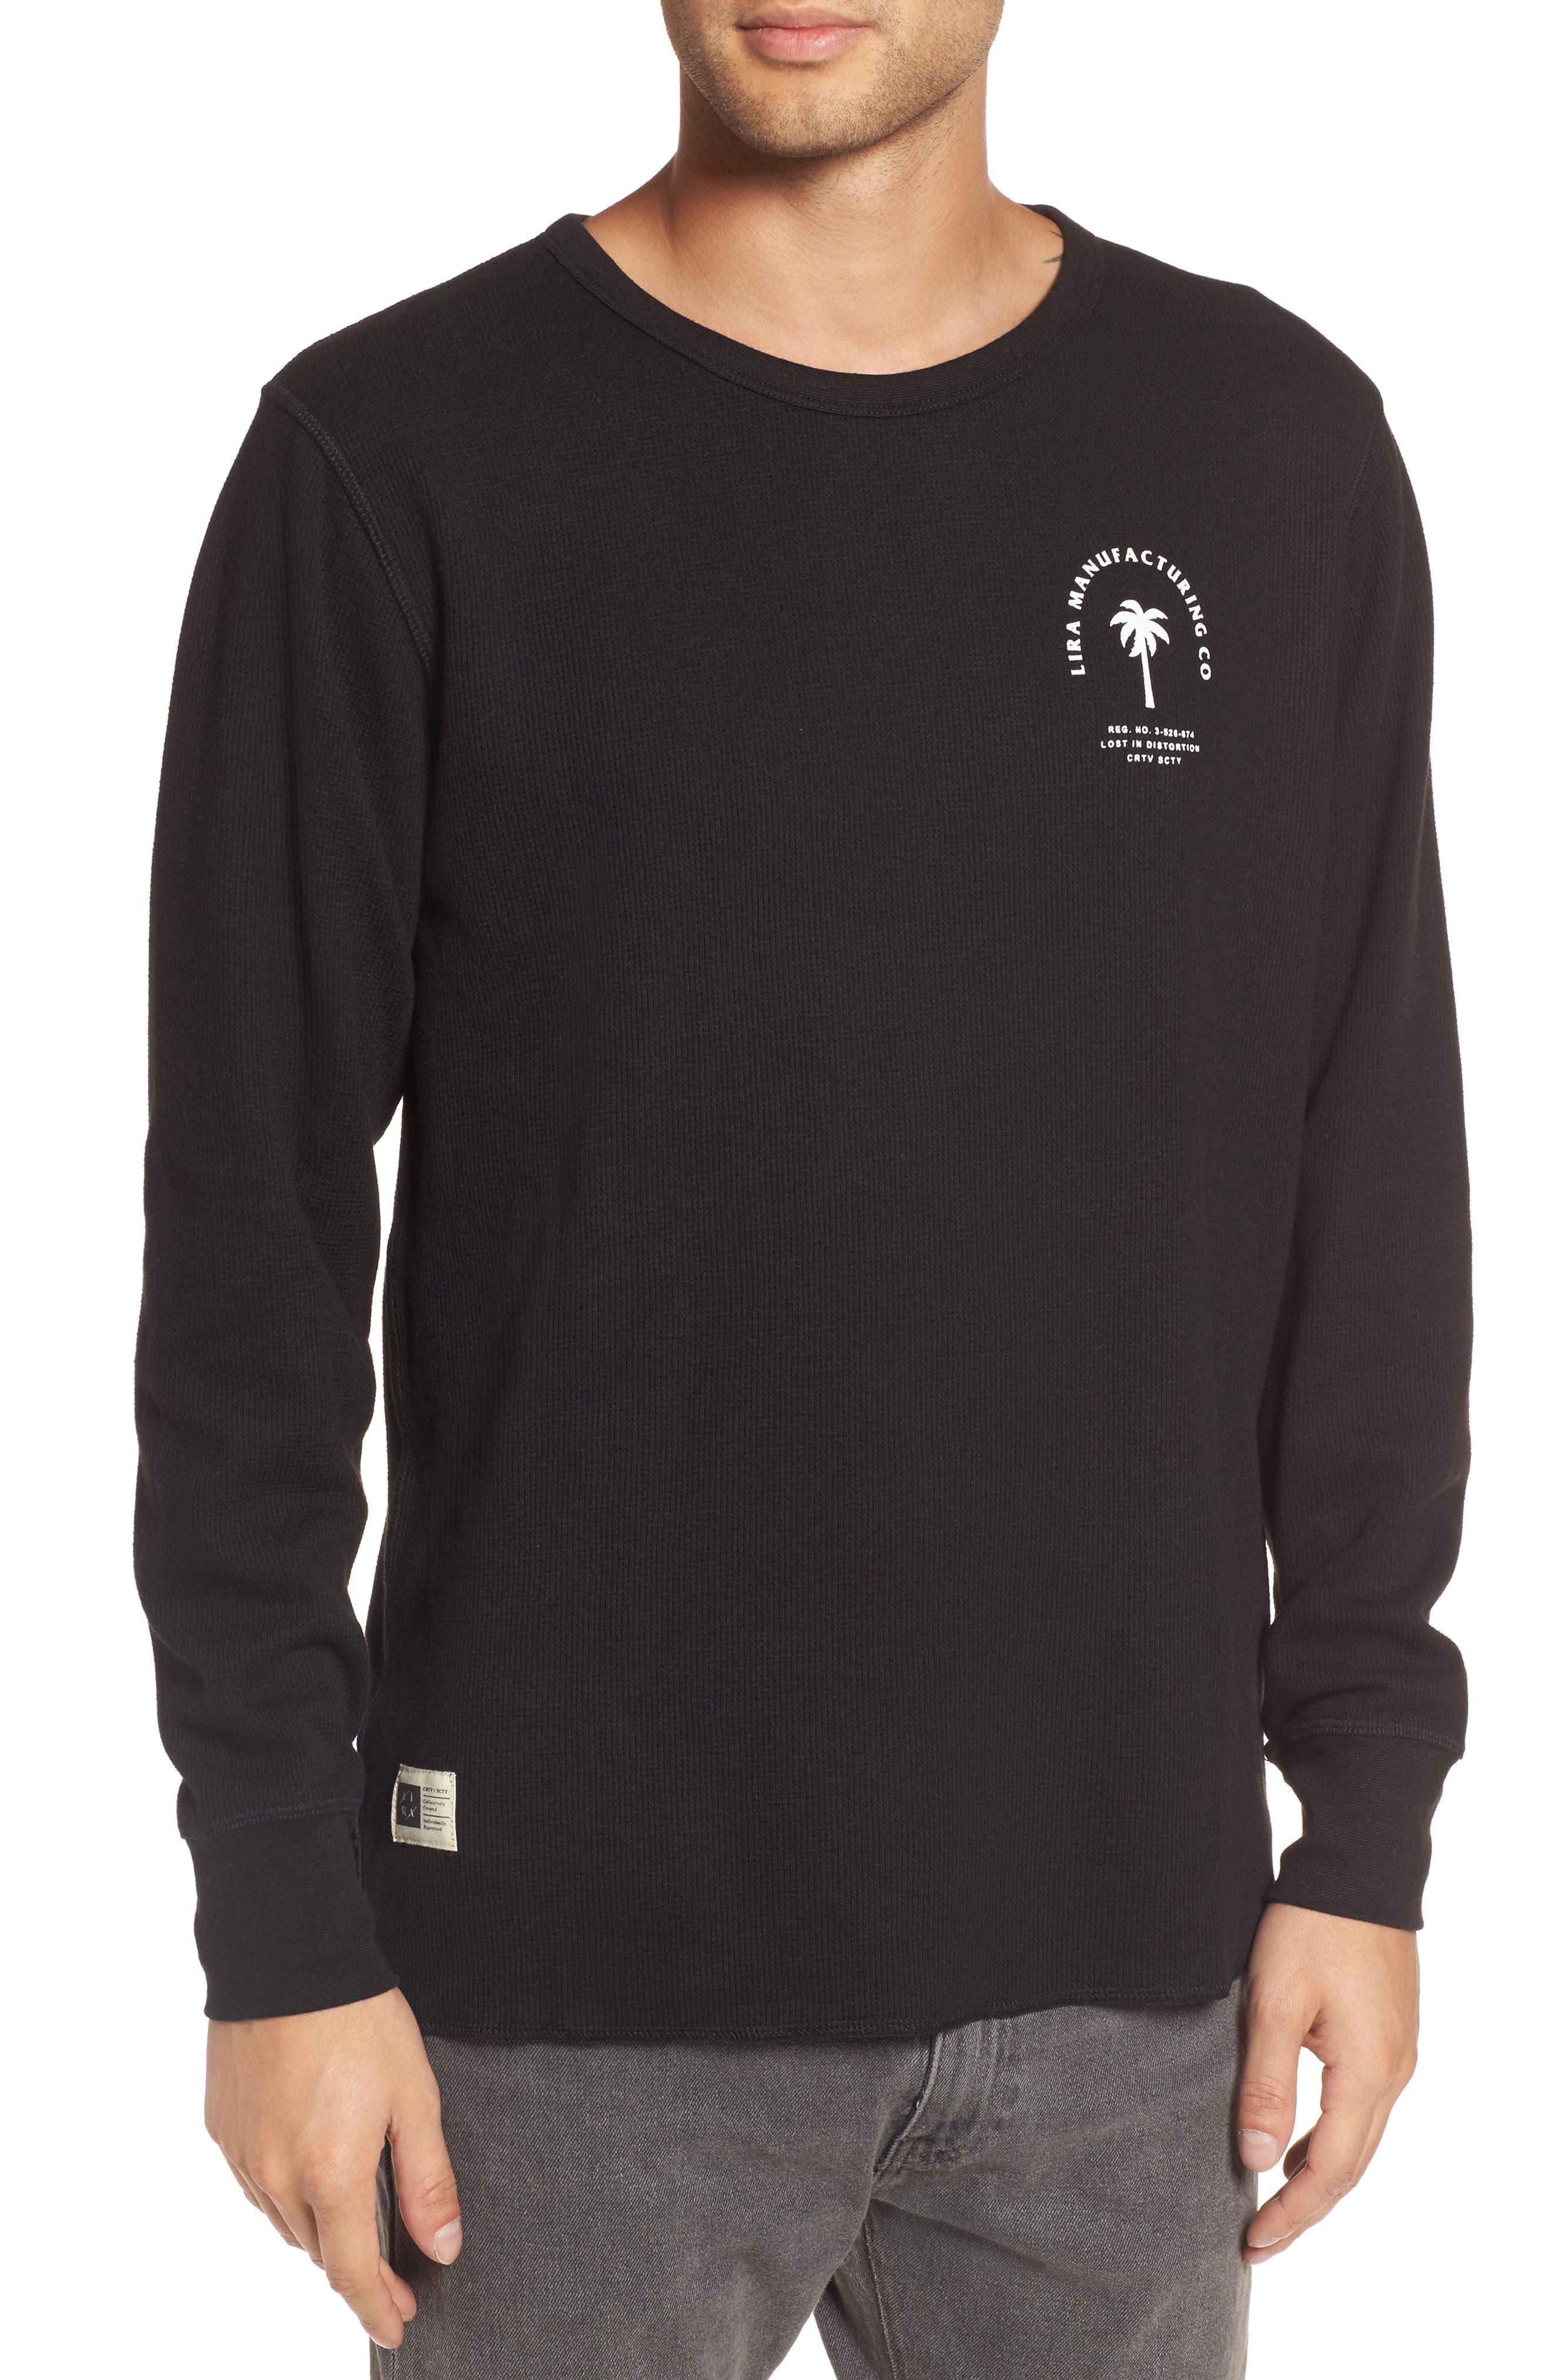 Cochino Thermal T-shirt,                         Main,                         color, Black